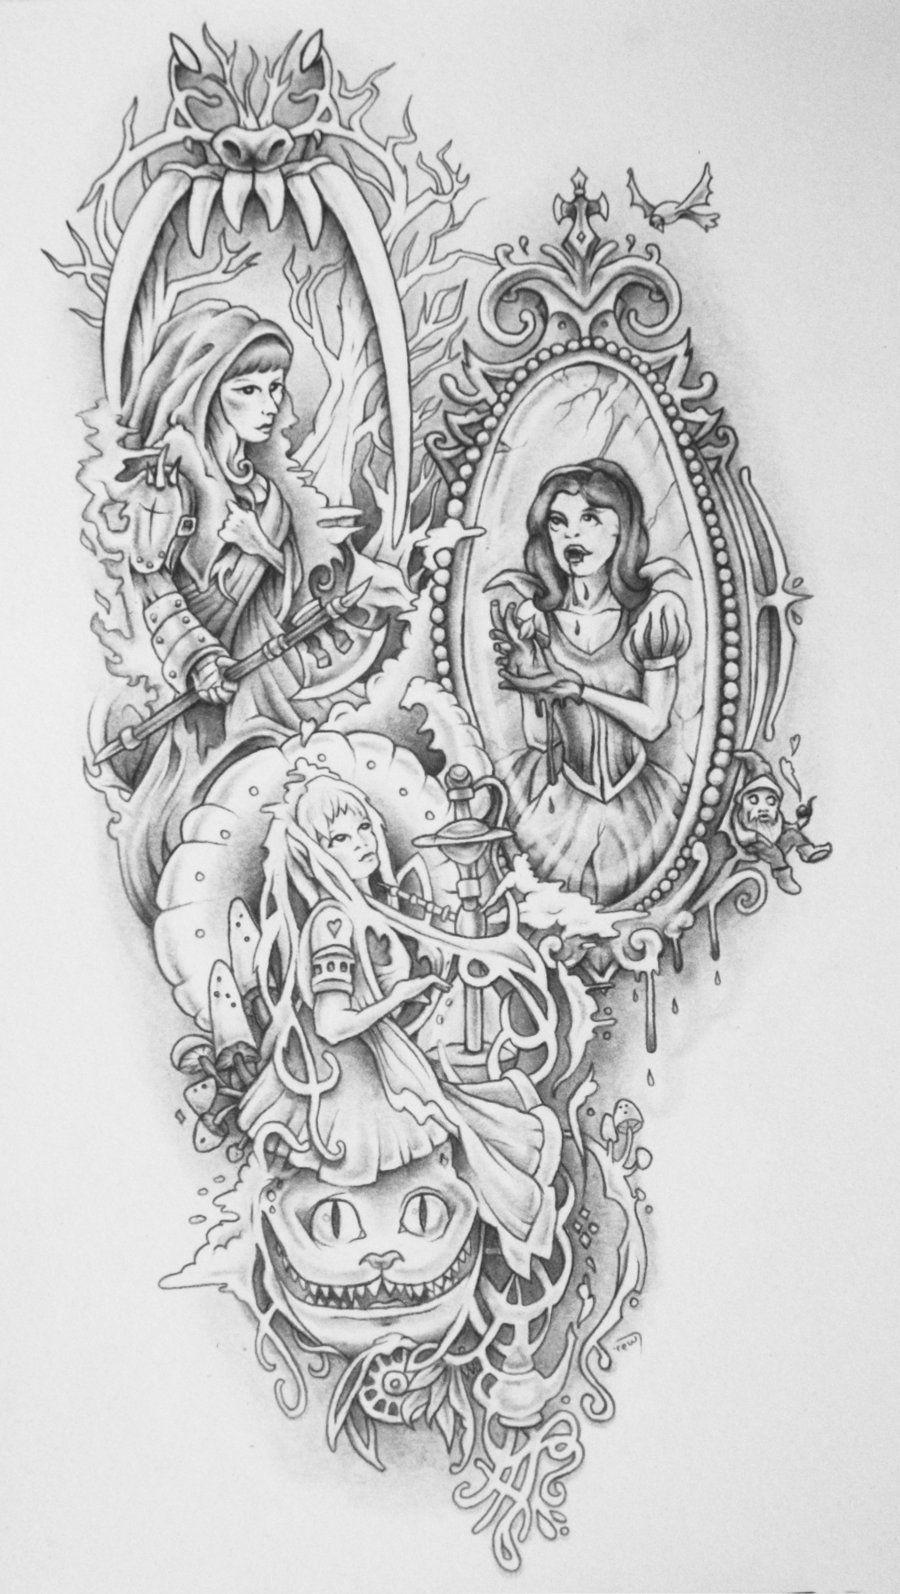 badass fairy tales tattoo shaded by on deviantart tattoos. Black Bedroom Furniture Sets. Home Design Ideas